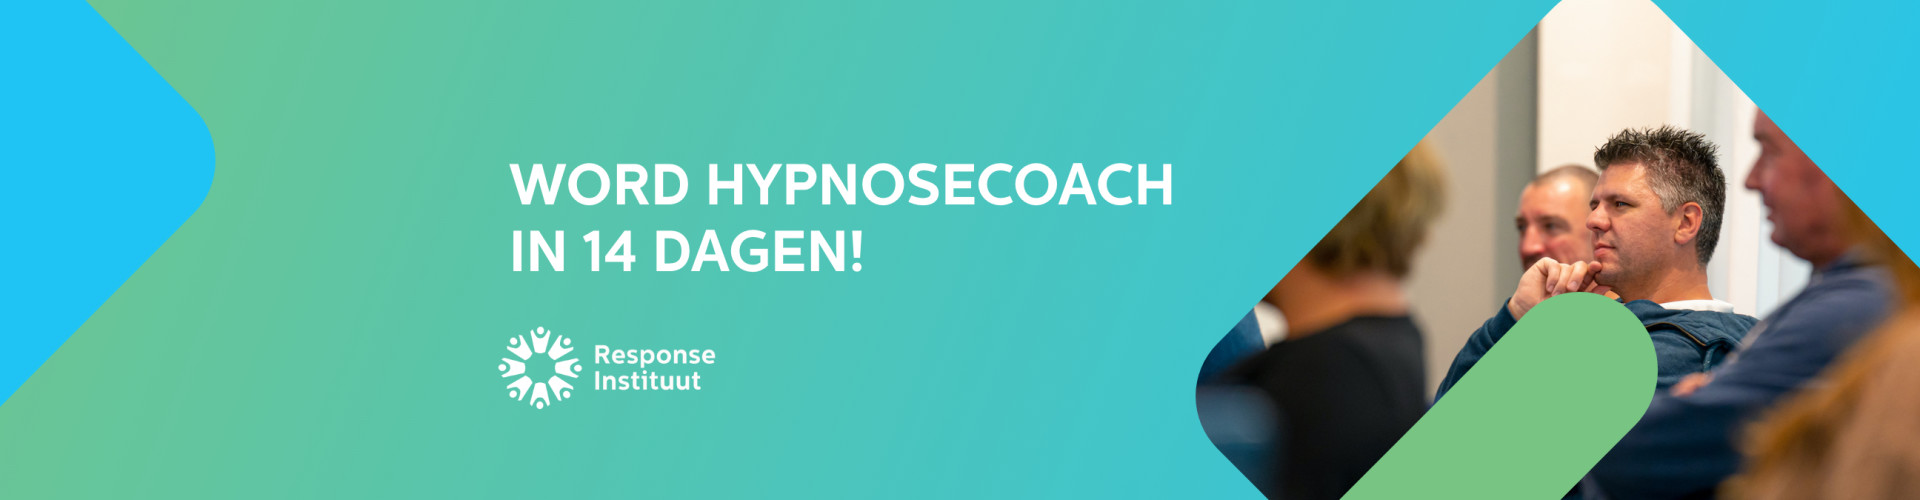 hypnosecoach-worden